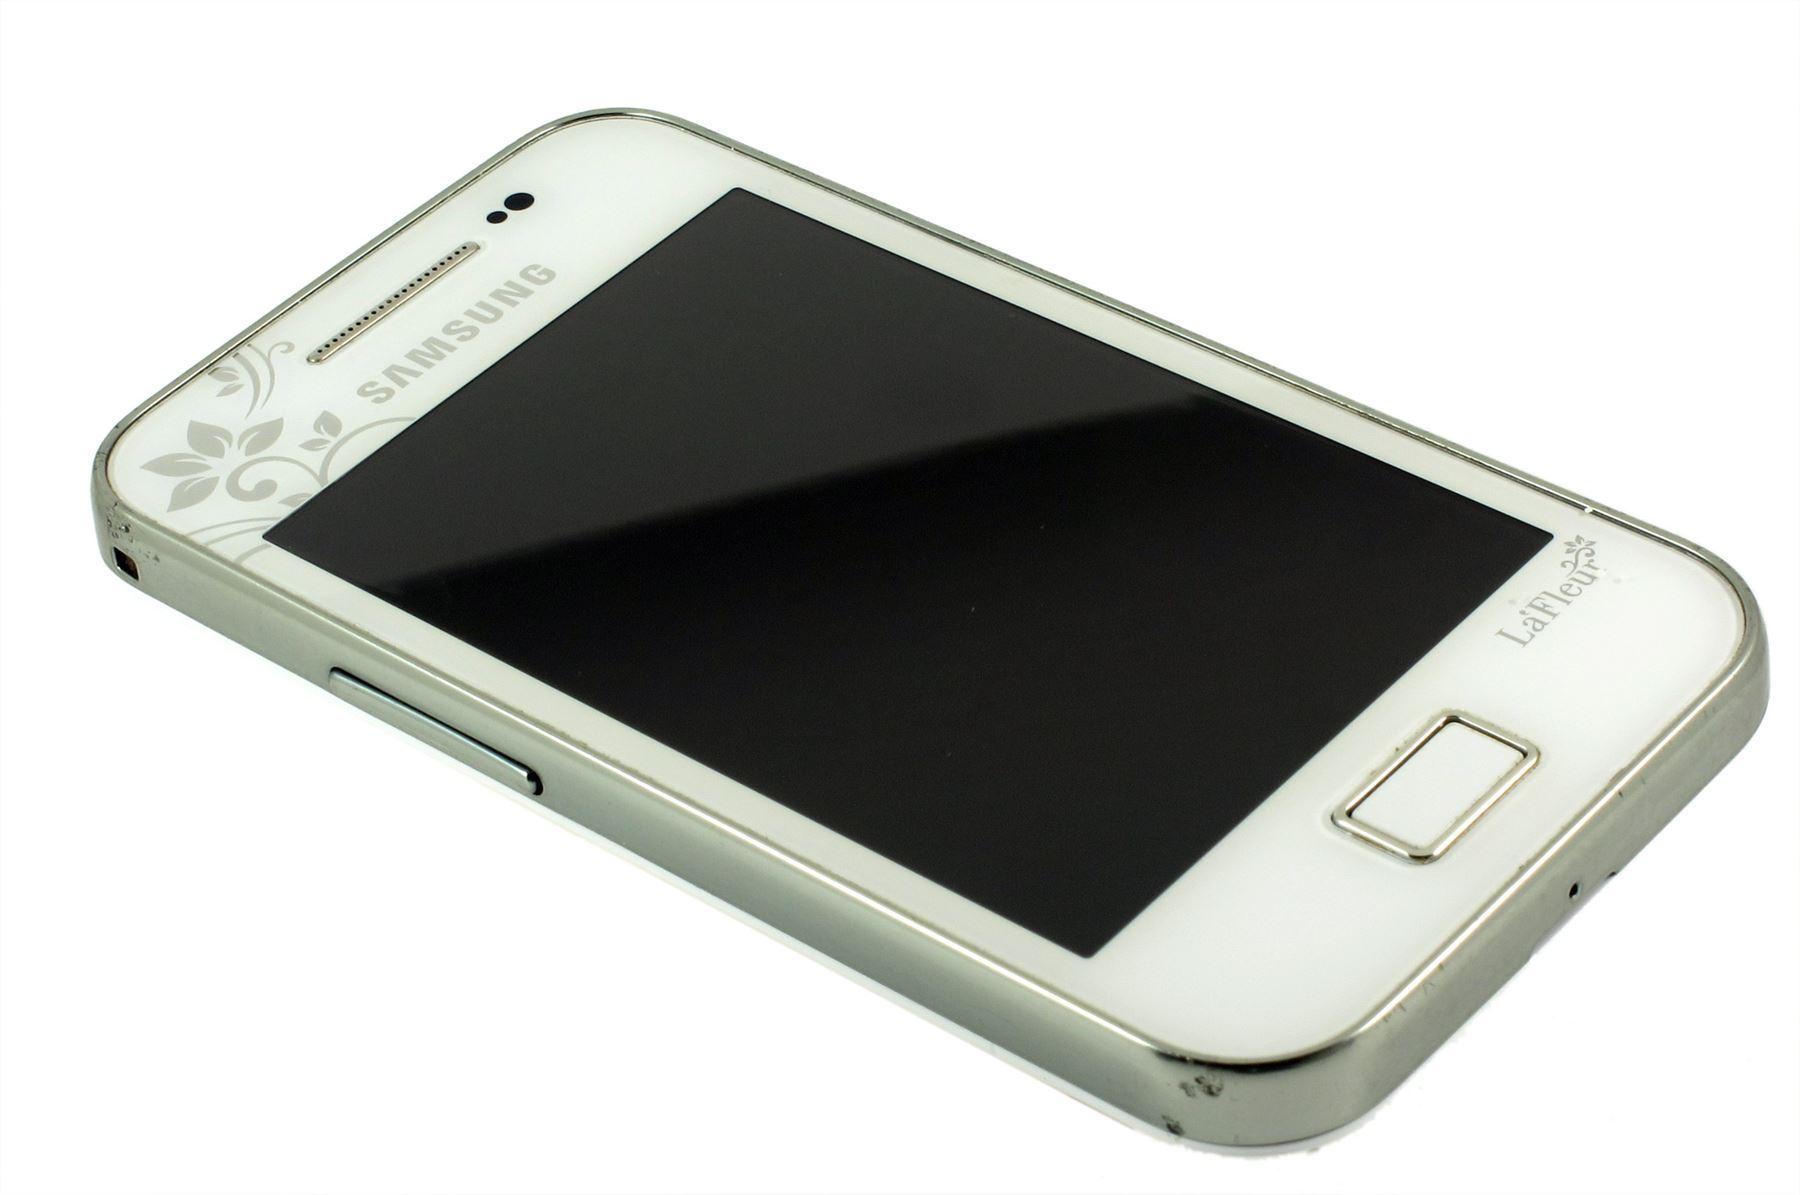 samsung galaxy ace lafleur white gt s5830i unlocked android smartphone 8806085002418 ebay. Black Bedroom Furniture Sets. Home Design Ideas